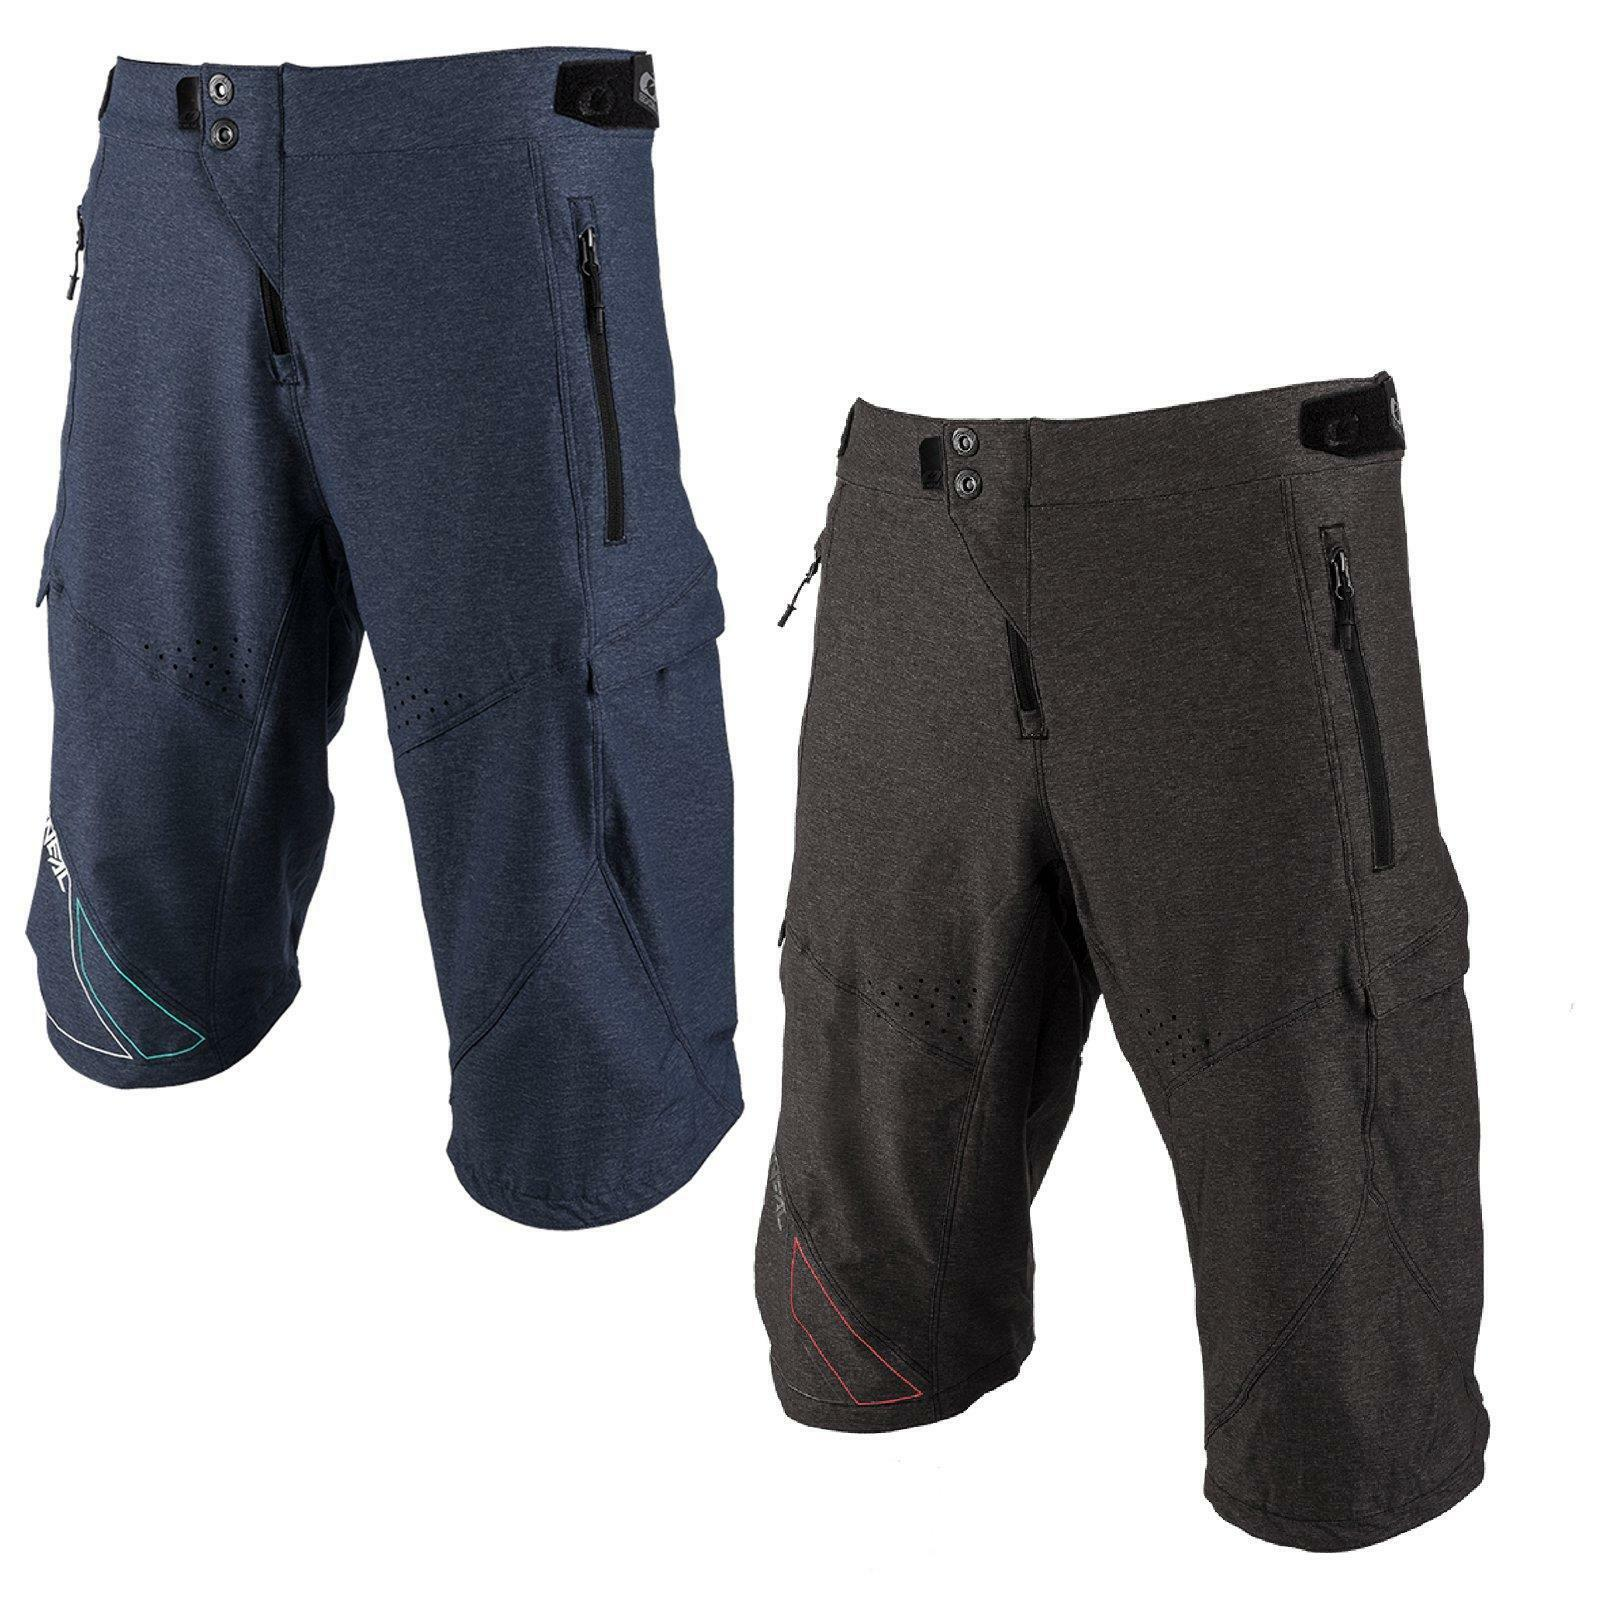 ONEAL new Stormrider Shorts Mountain Bike Pants Shorts Bicycle MTB DH Trail Downhill